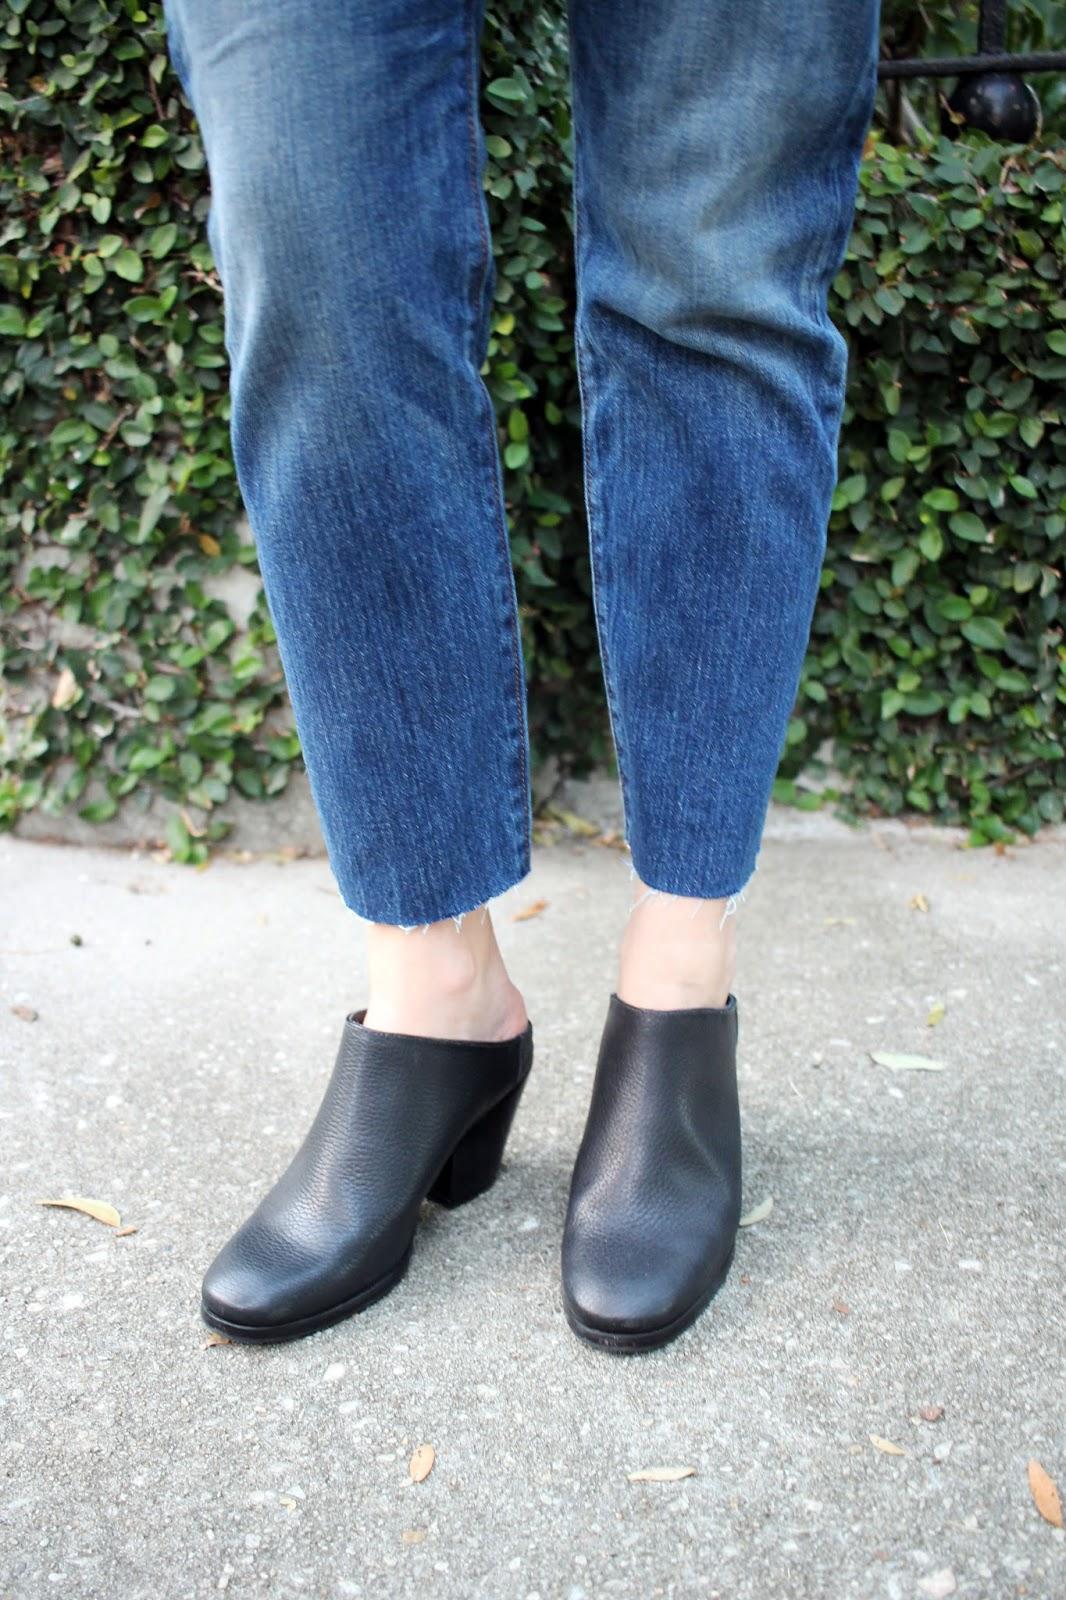 Levi Wedgie Jeans + Rachel Comey Mars Mule